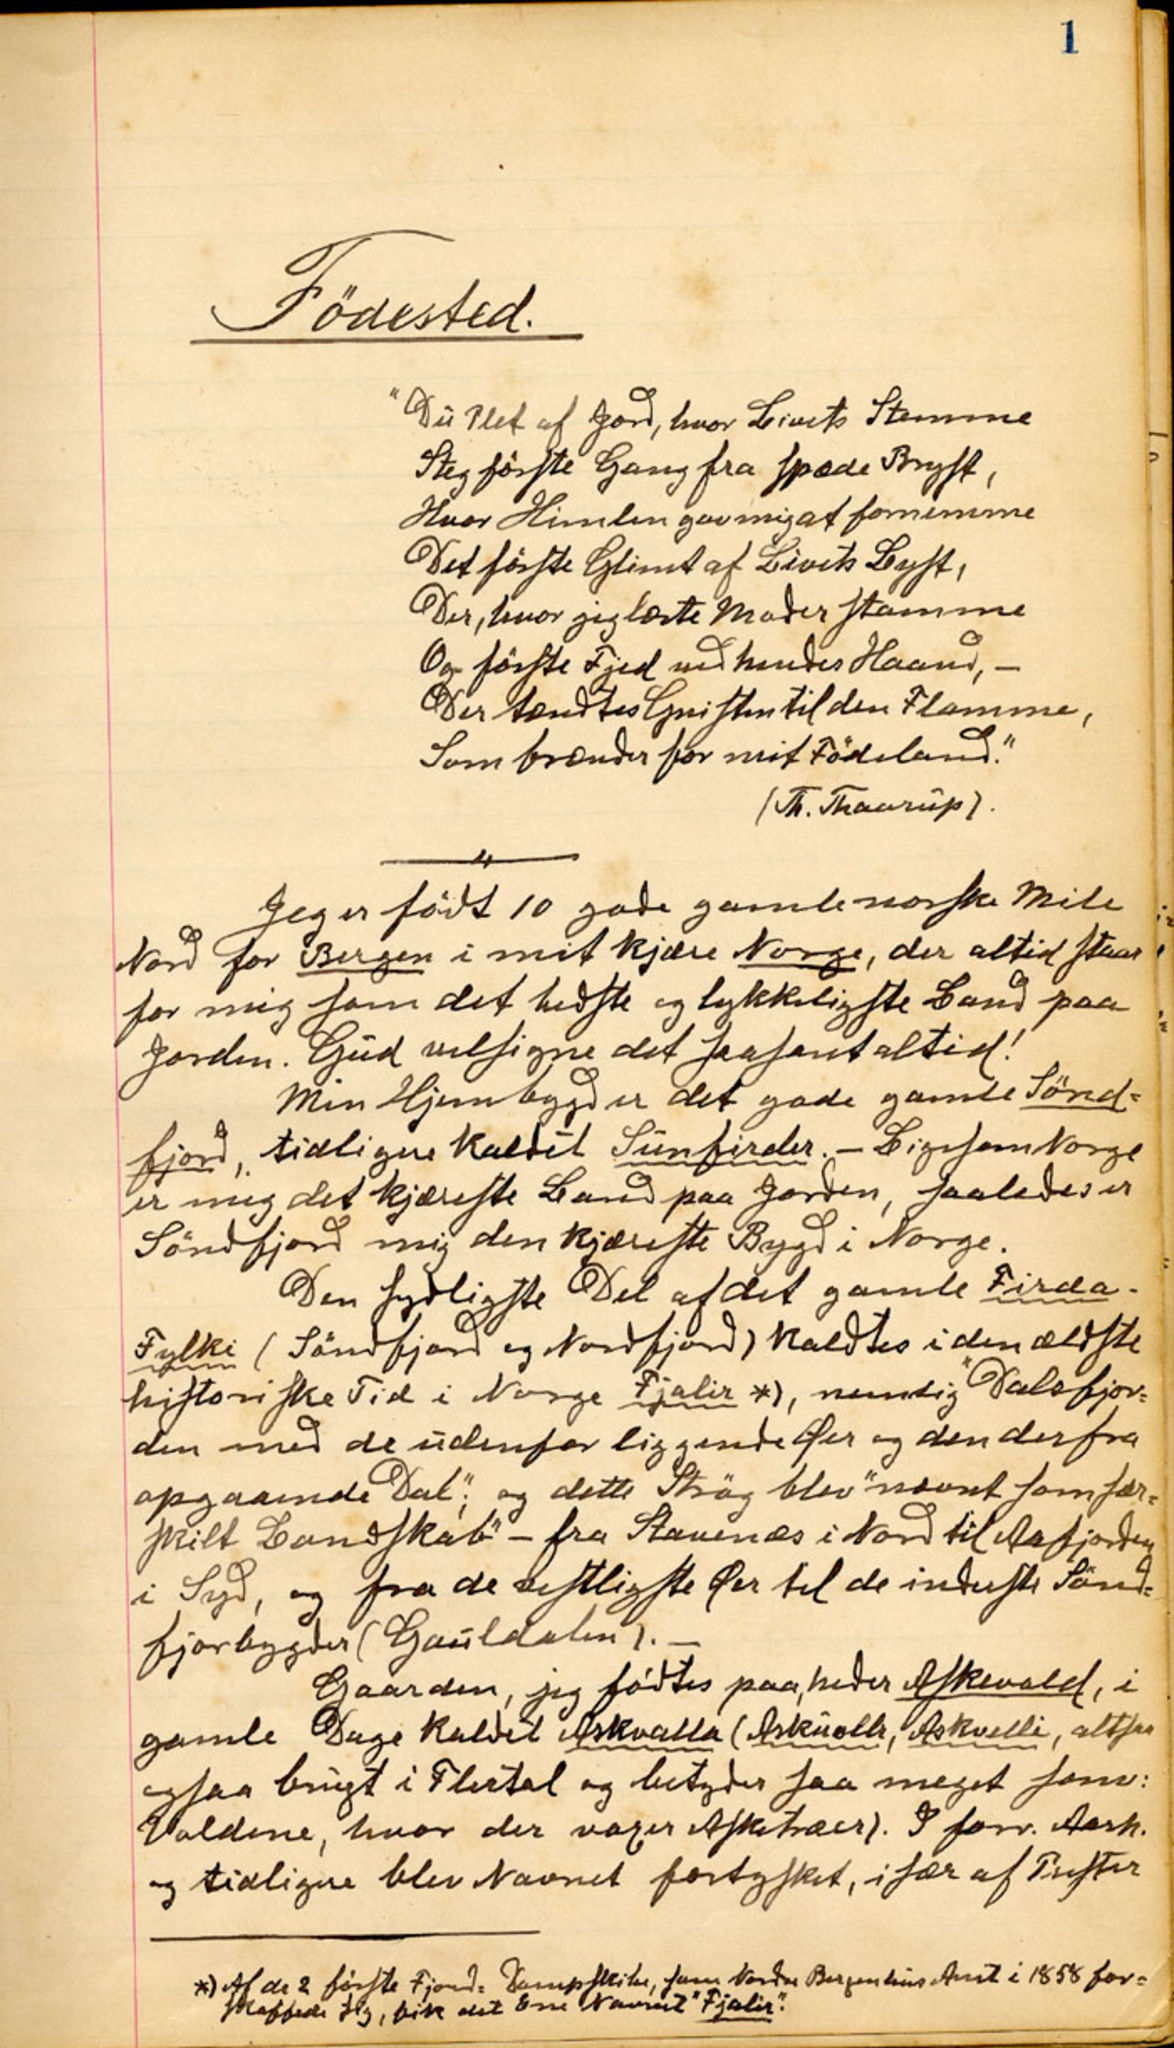 LOK, Bernt Askevolds samling (Askvoll bibliotek), 1846-1926, s. 1